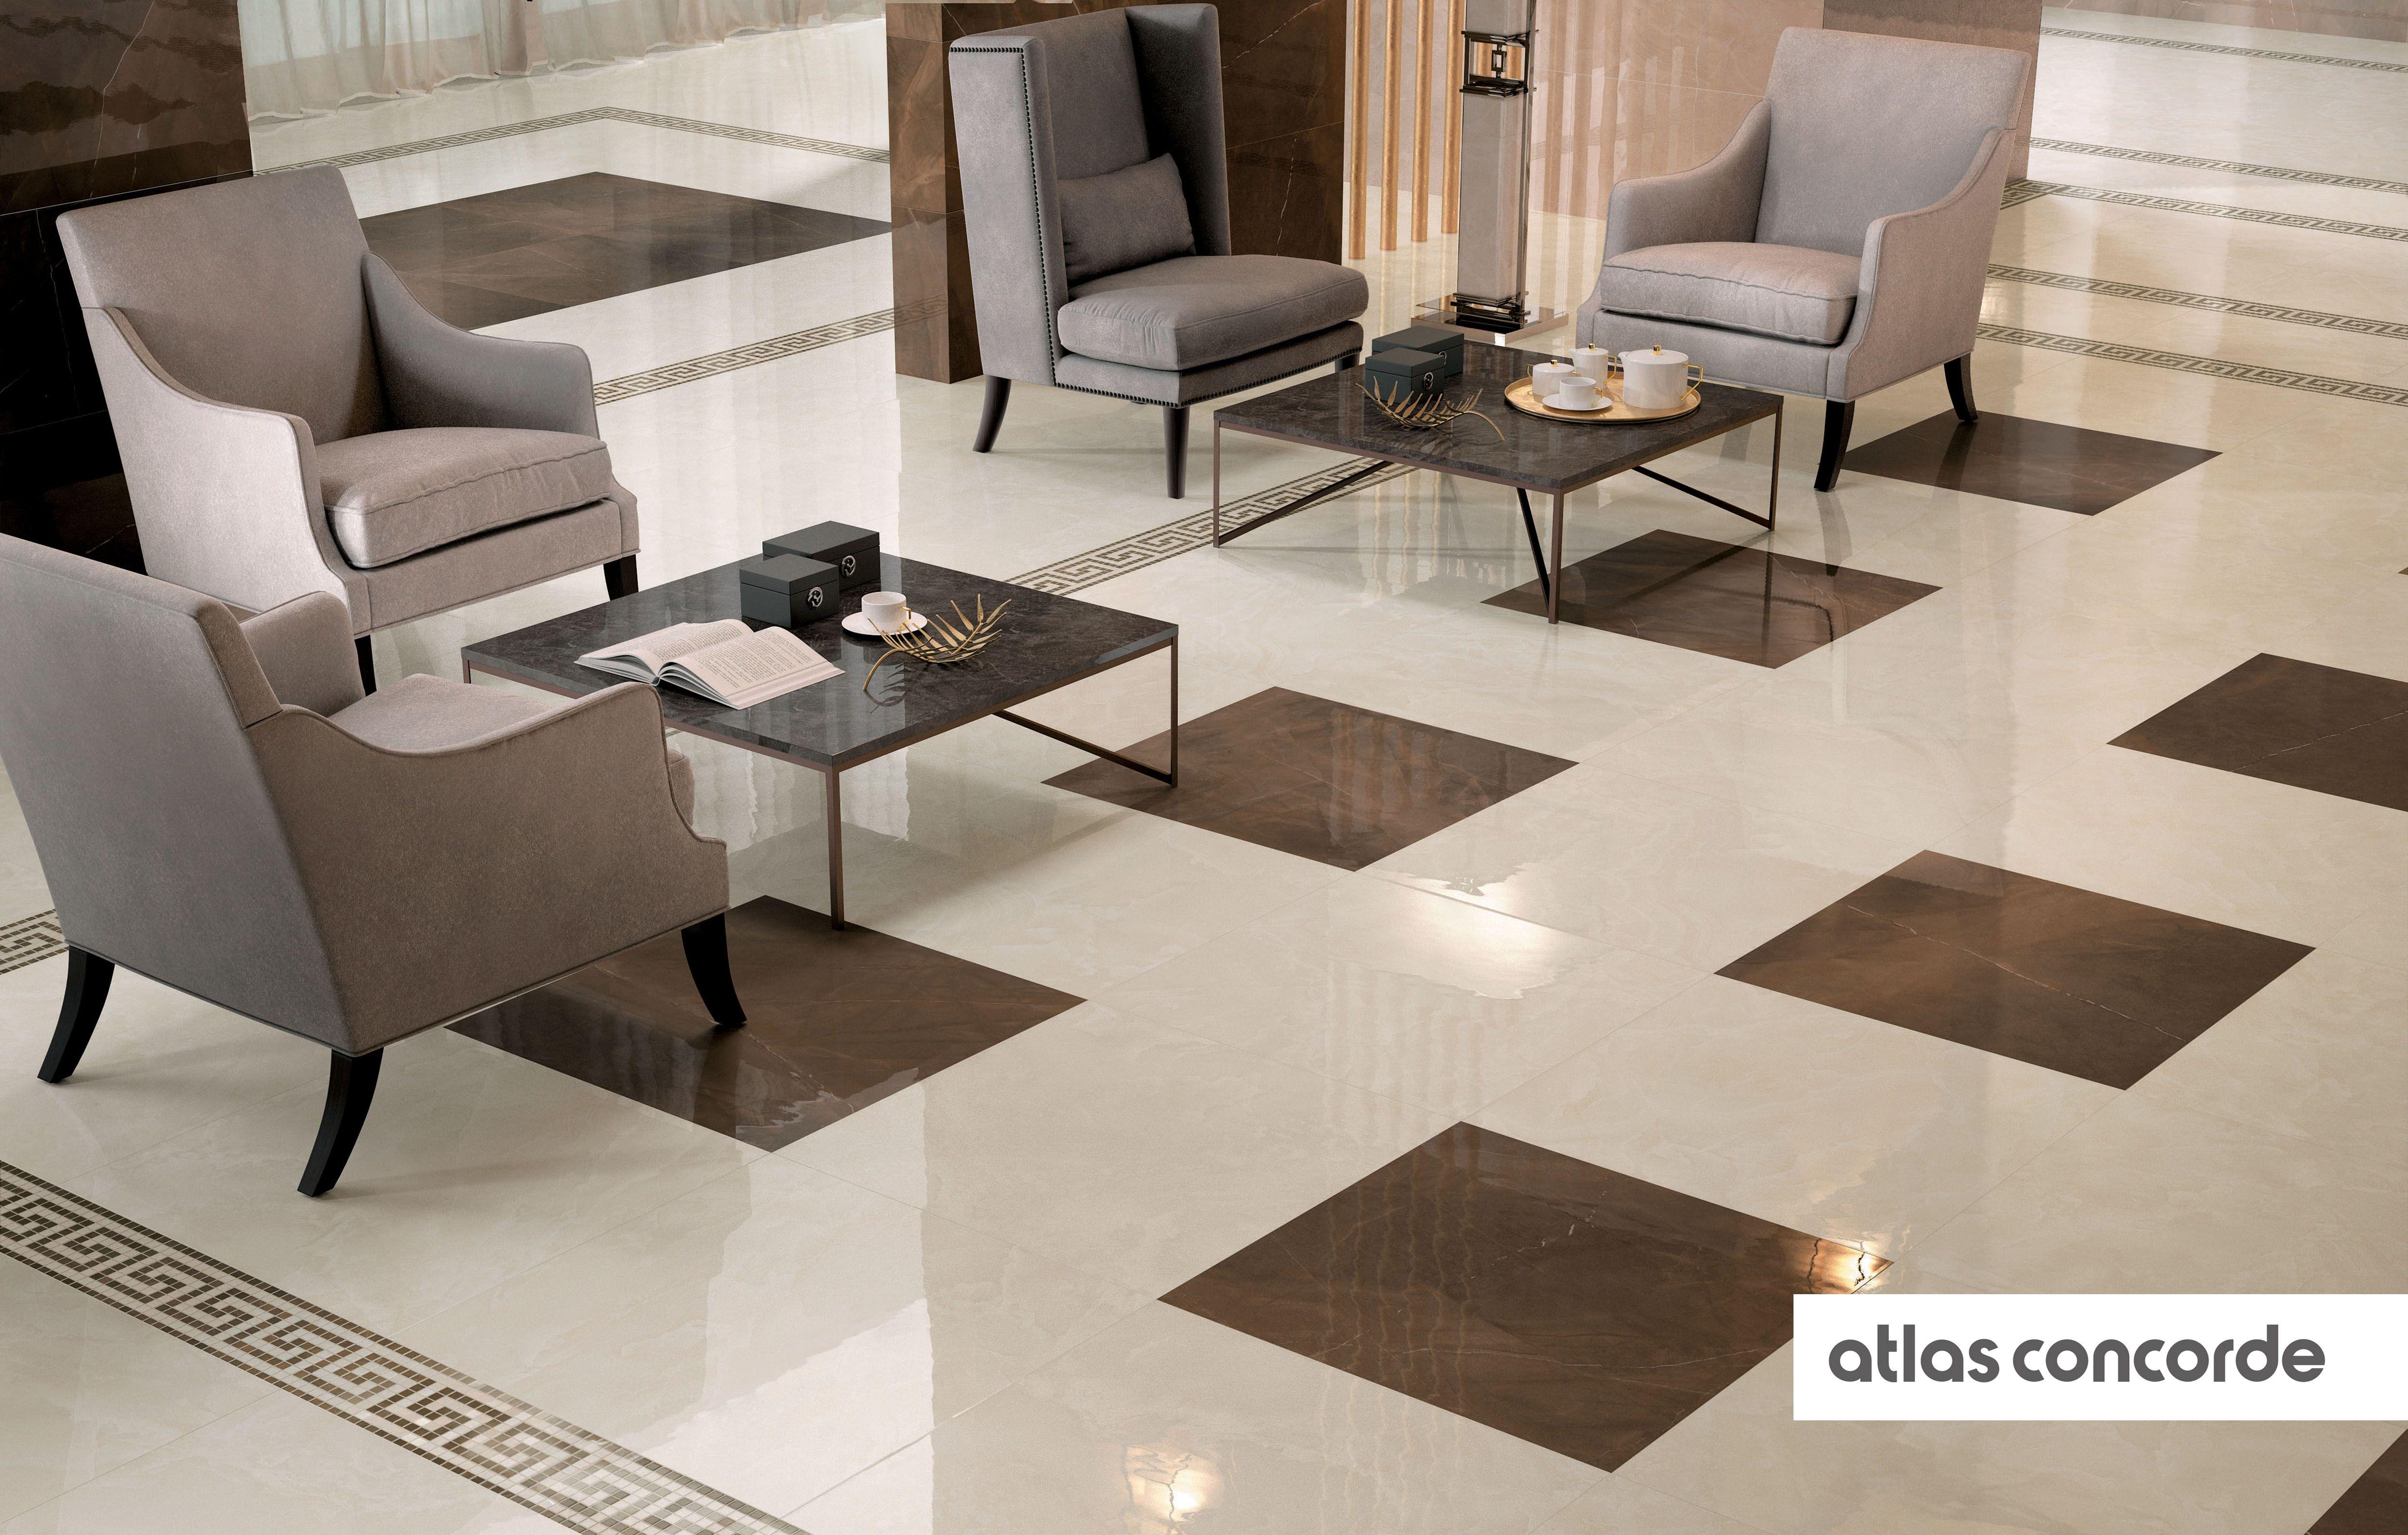 Atlas Concorde Piastrelle in Ceramica e Gres Porcellanato   Room tiles design, Marble flooring ...